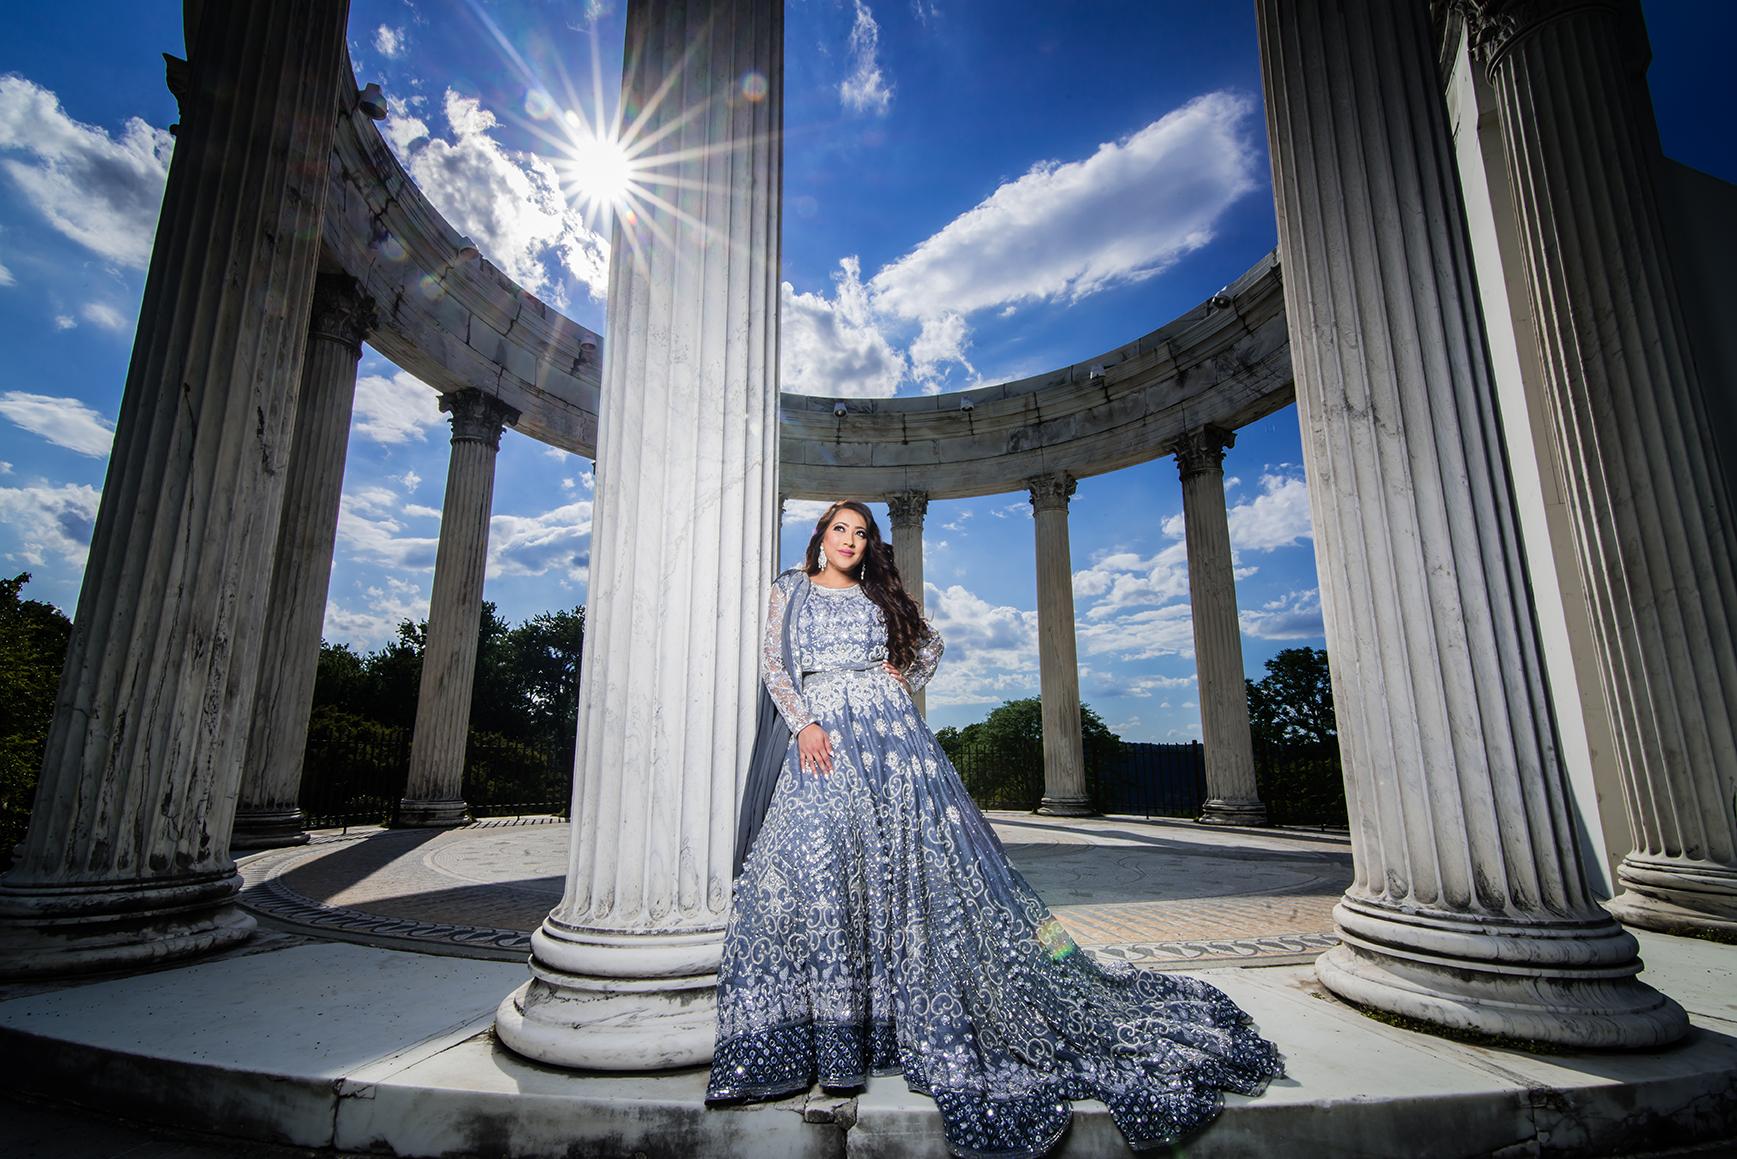 south_asian_wedding_photography_dhoom_studio_new_york28 SOUTH ASIAN WEDDINGS